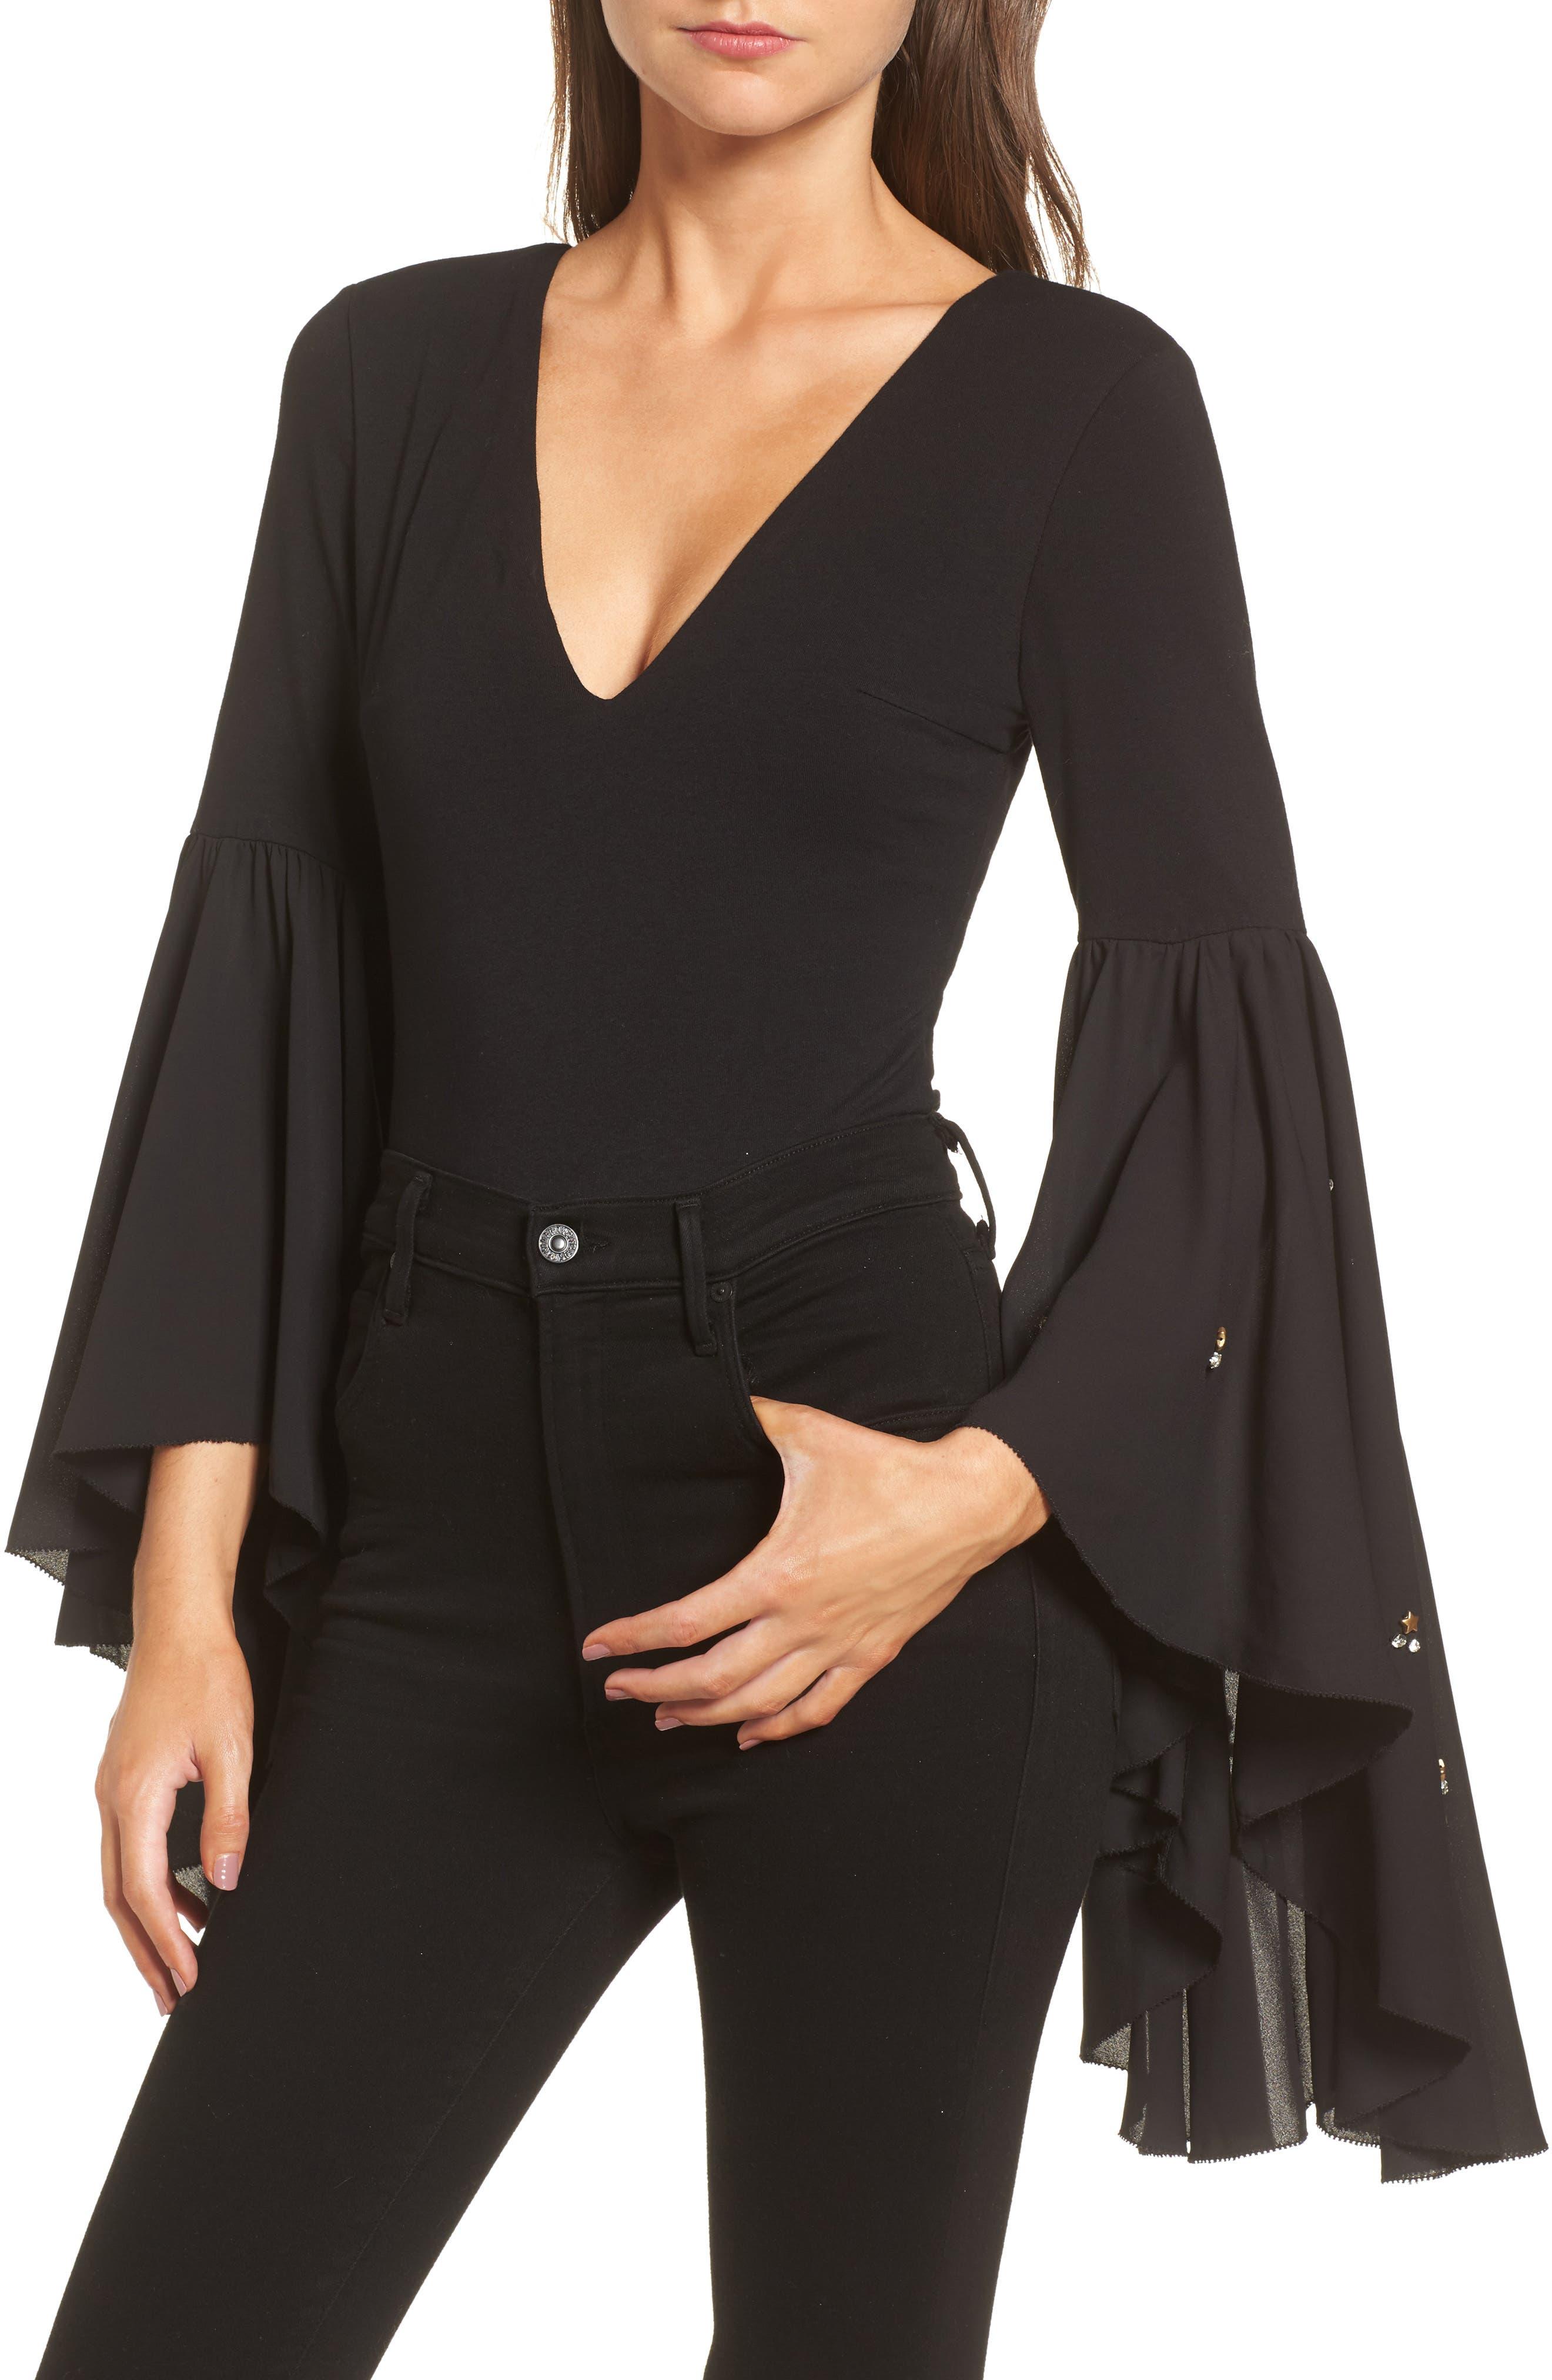 Main Image - LOST INK Embellished Flare Sleeve Bodysuit